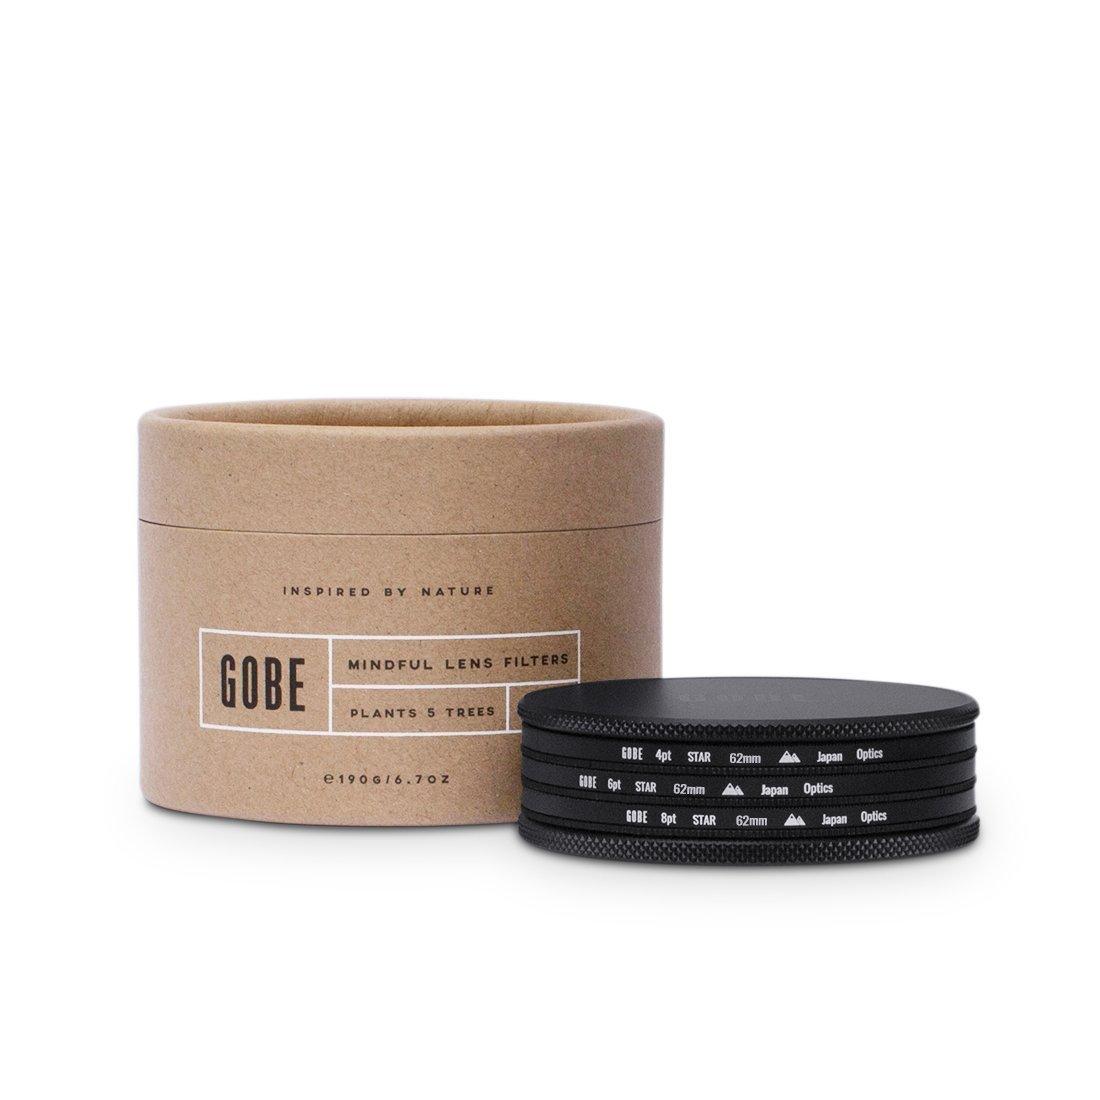 Gobe Star Filter Kit 62mm: 4 Points, 6 Points, 8 Points by Gobe